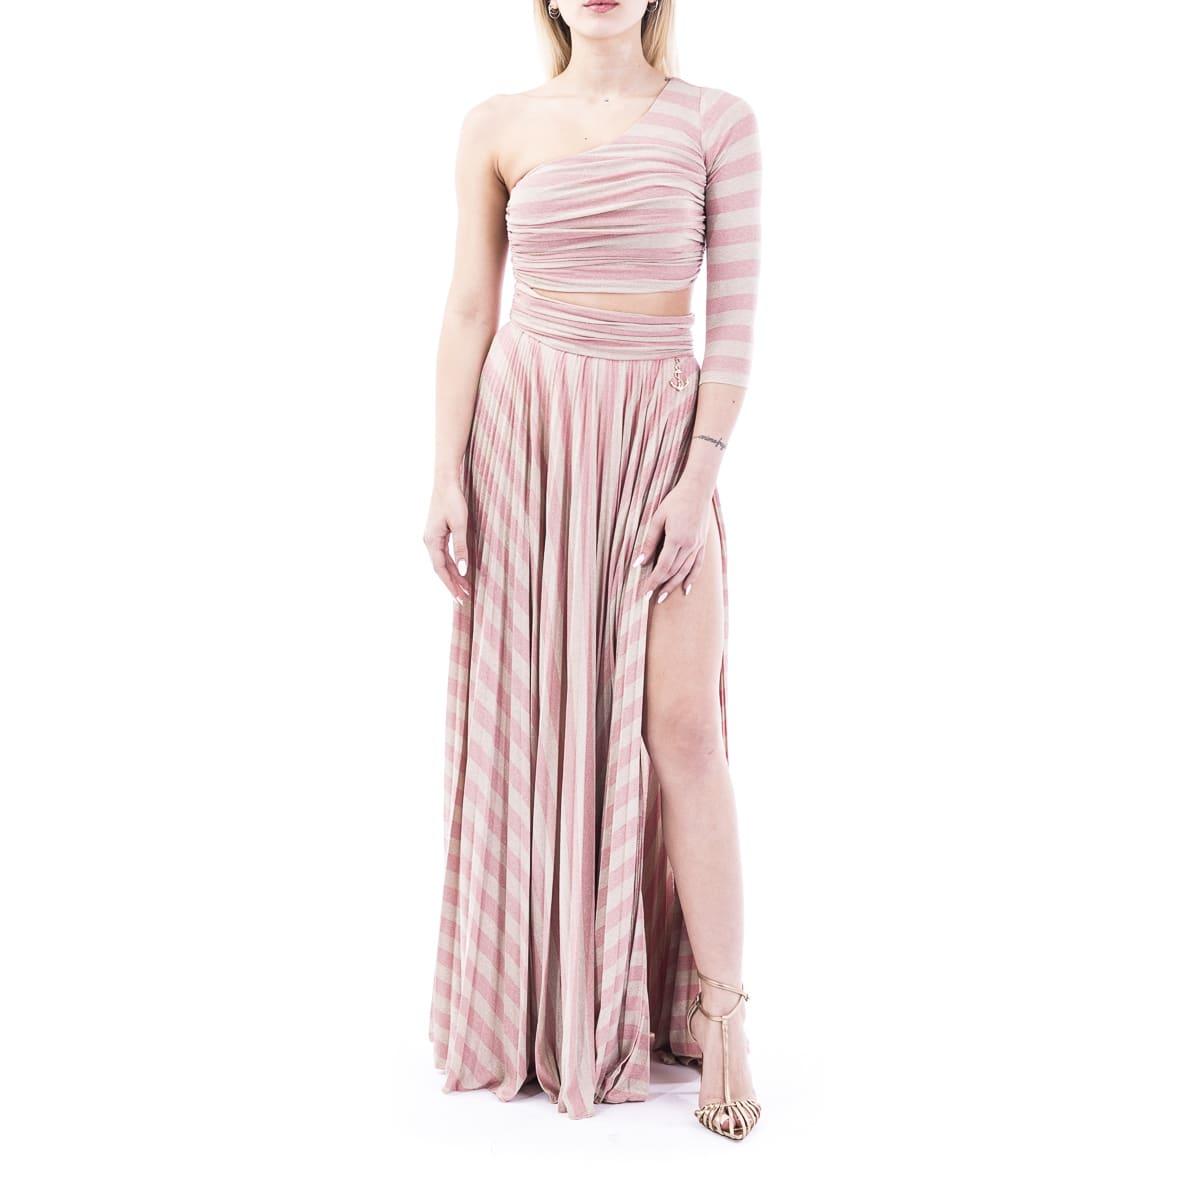 Buy Elisabetta Franchi Viscose Blend Dress online, shop Elisabetta Franchi Celyn B. with free shipping